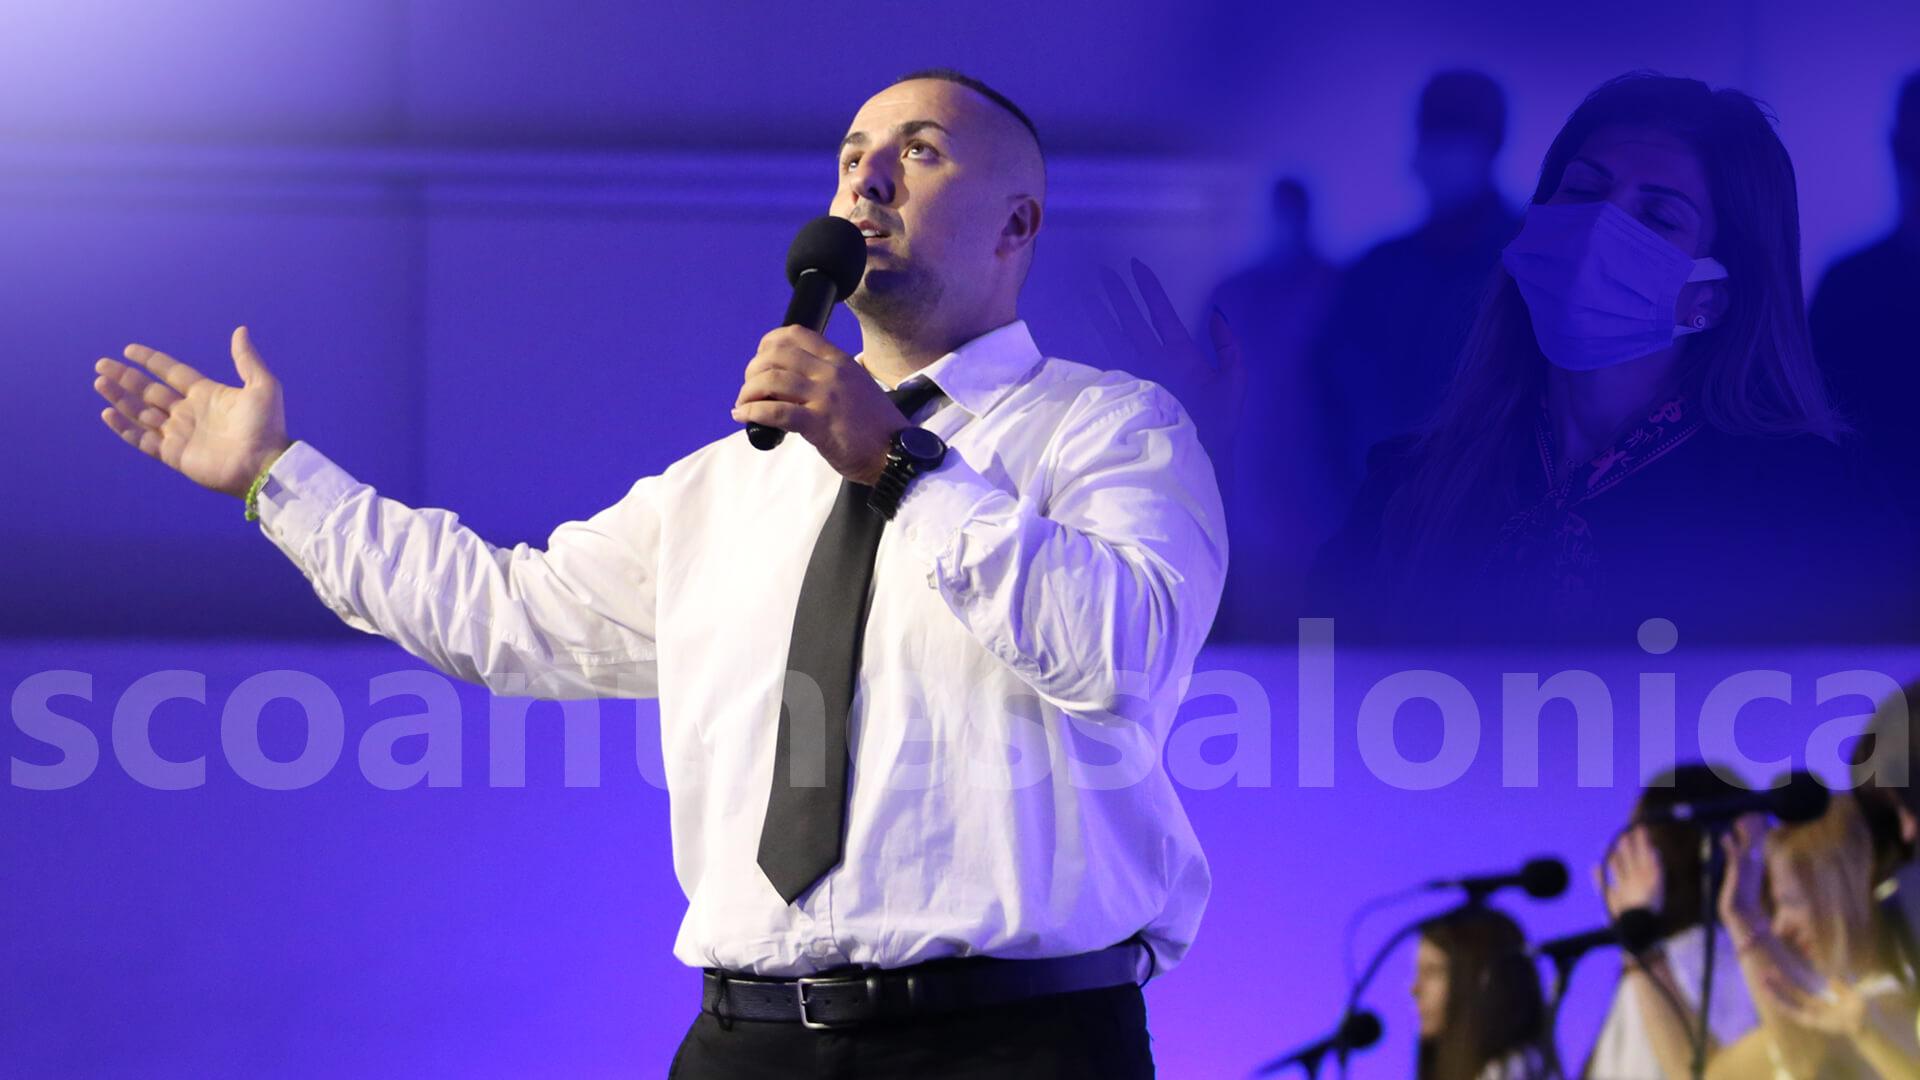 SCOAN_THESSALONICA_WORSHIP_2021_09_05